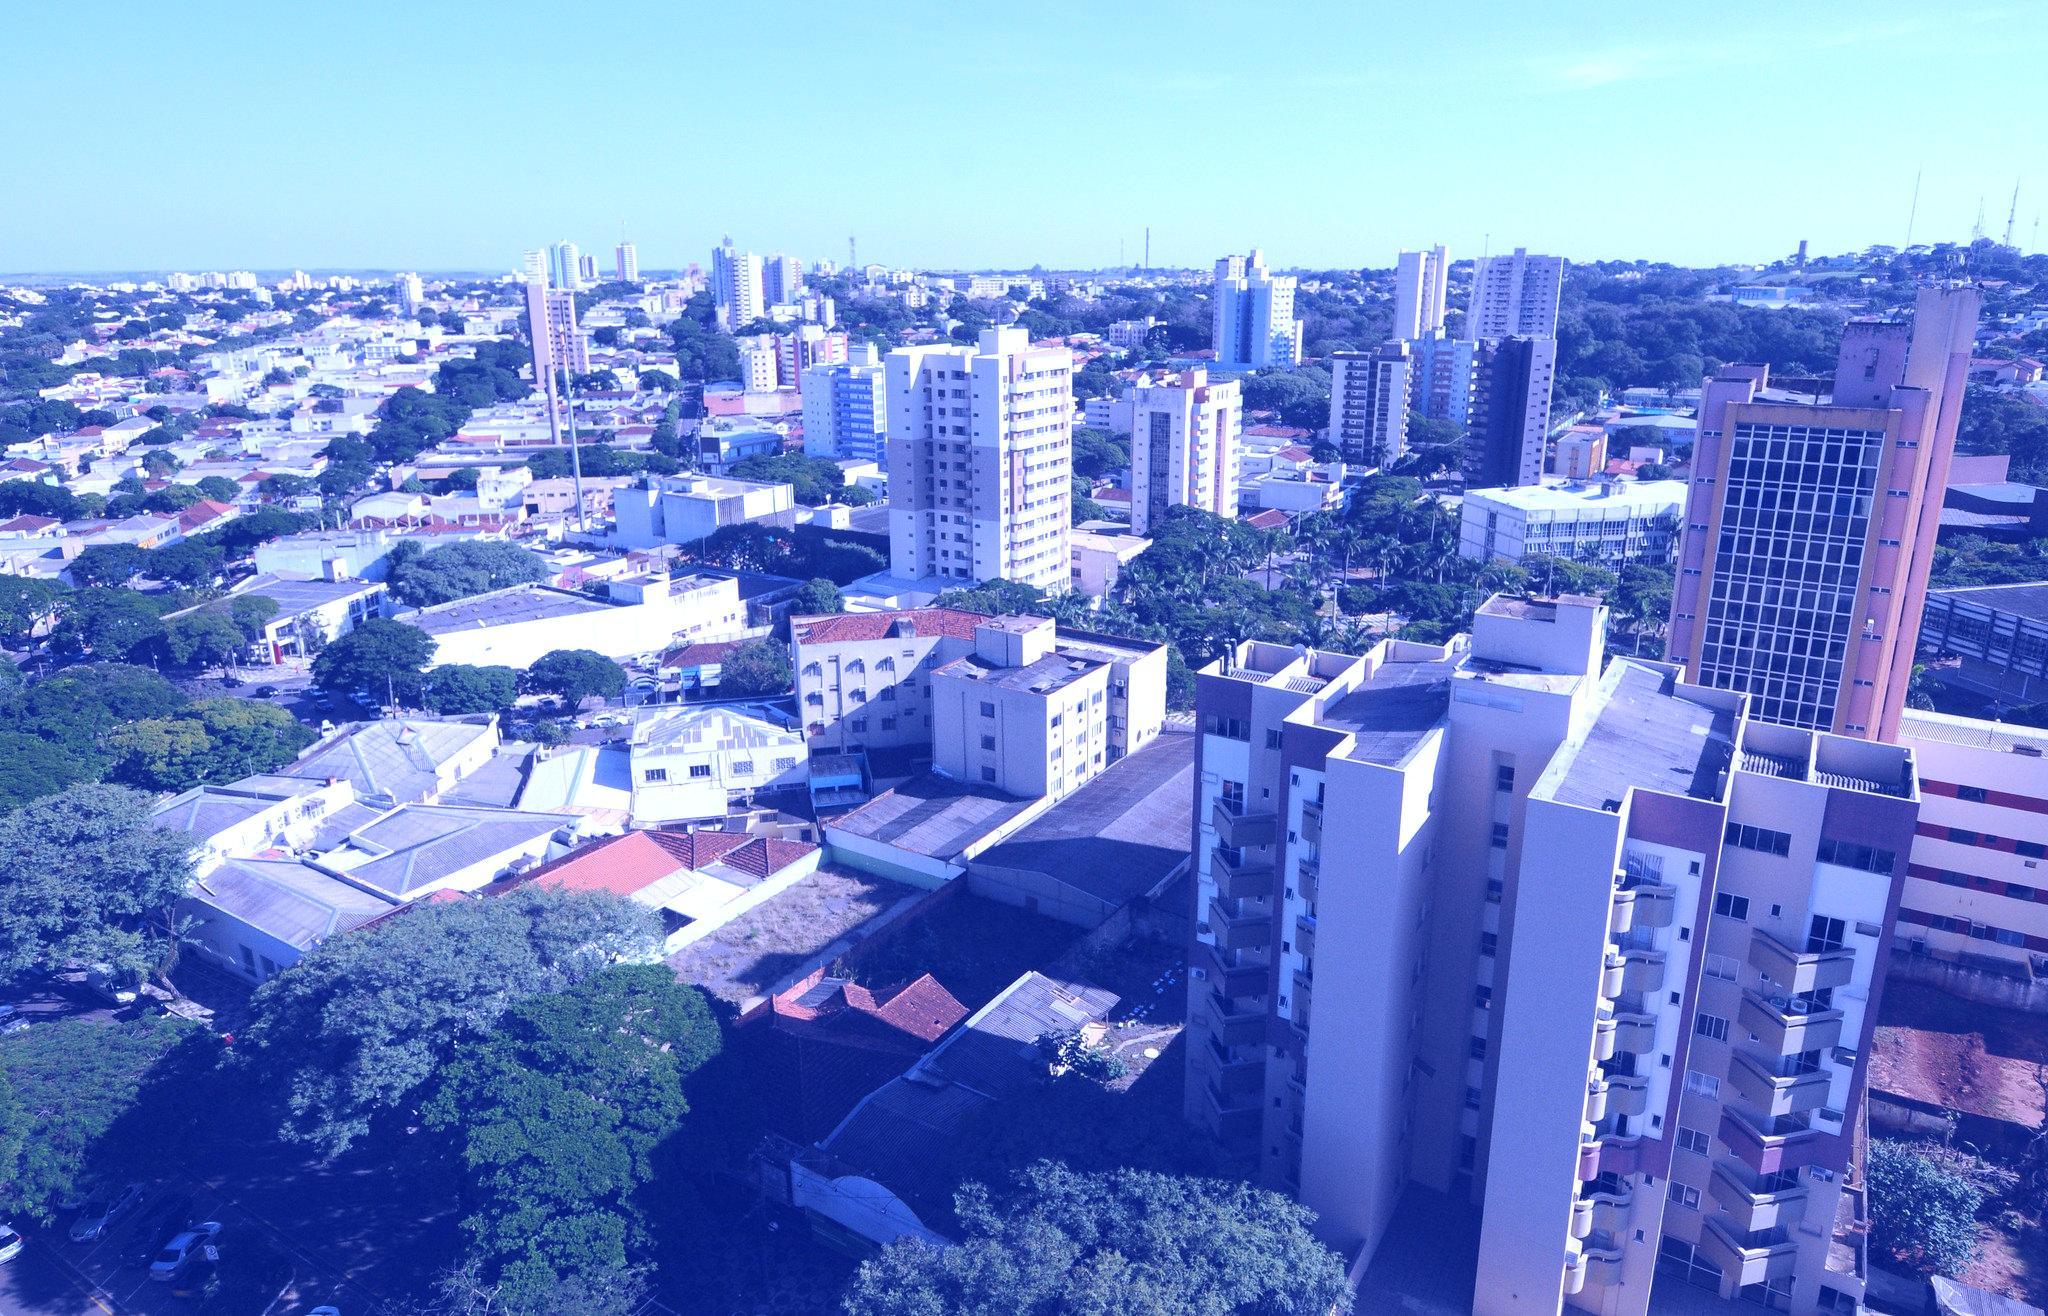 Mei Microempreendedor em Umuarama, PR